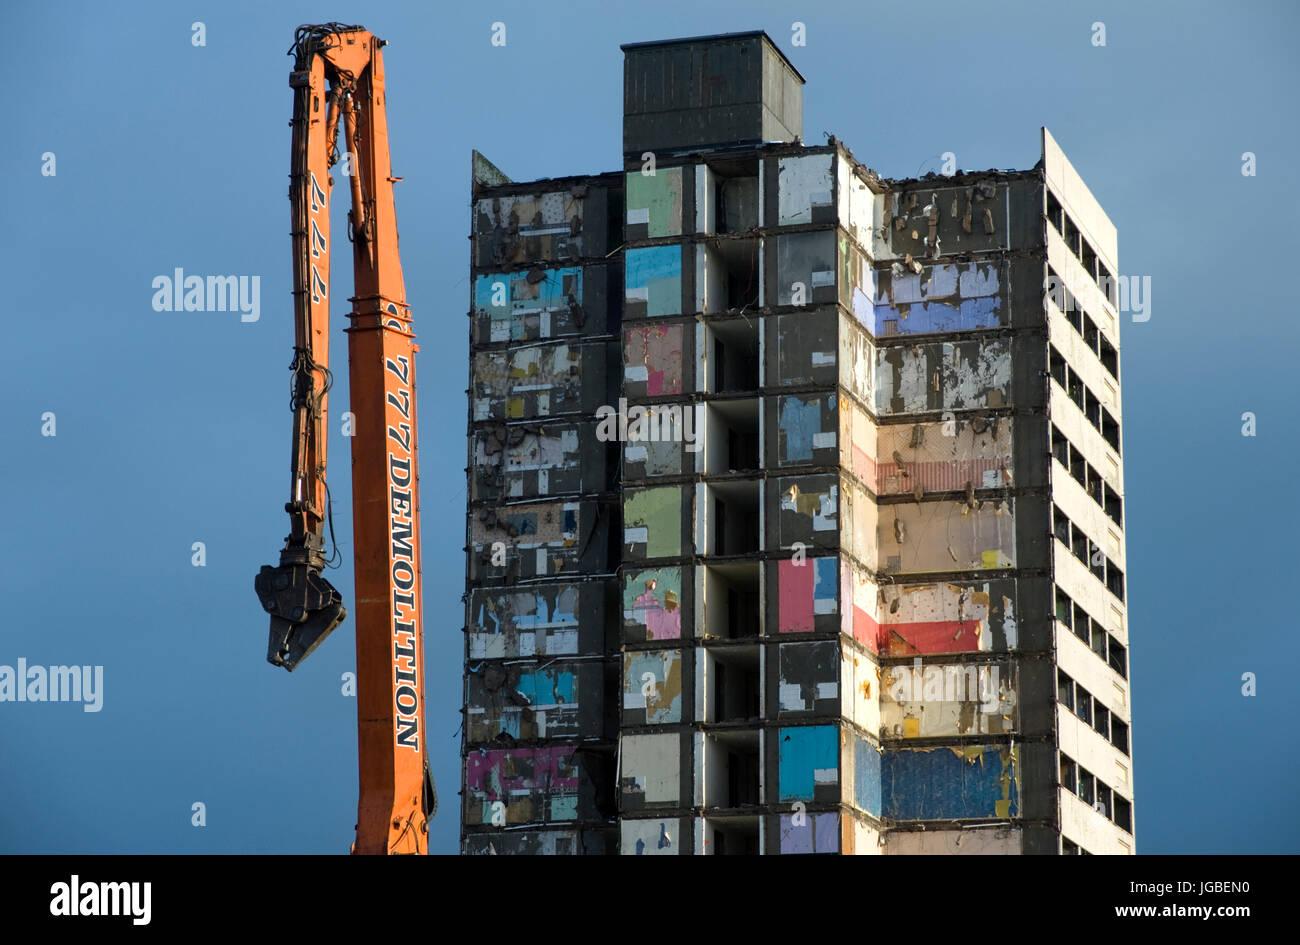 Demolition of tower block in Larne, County Antrim, Northern Ireland. - Stock Image